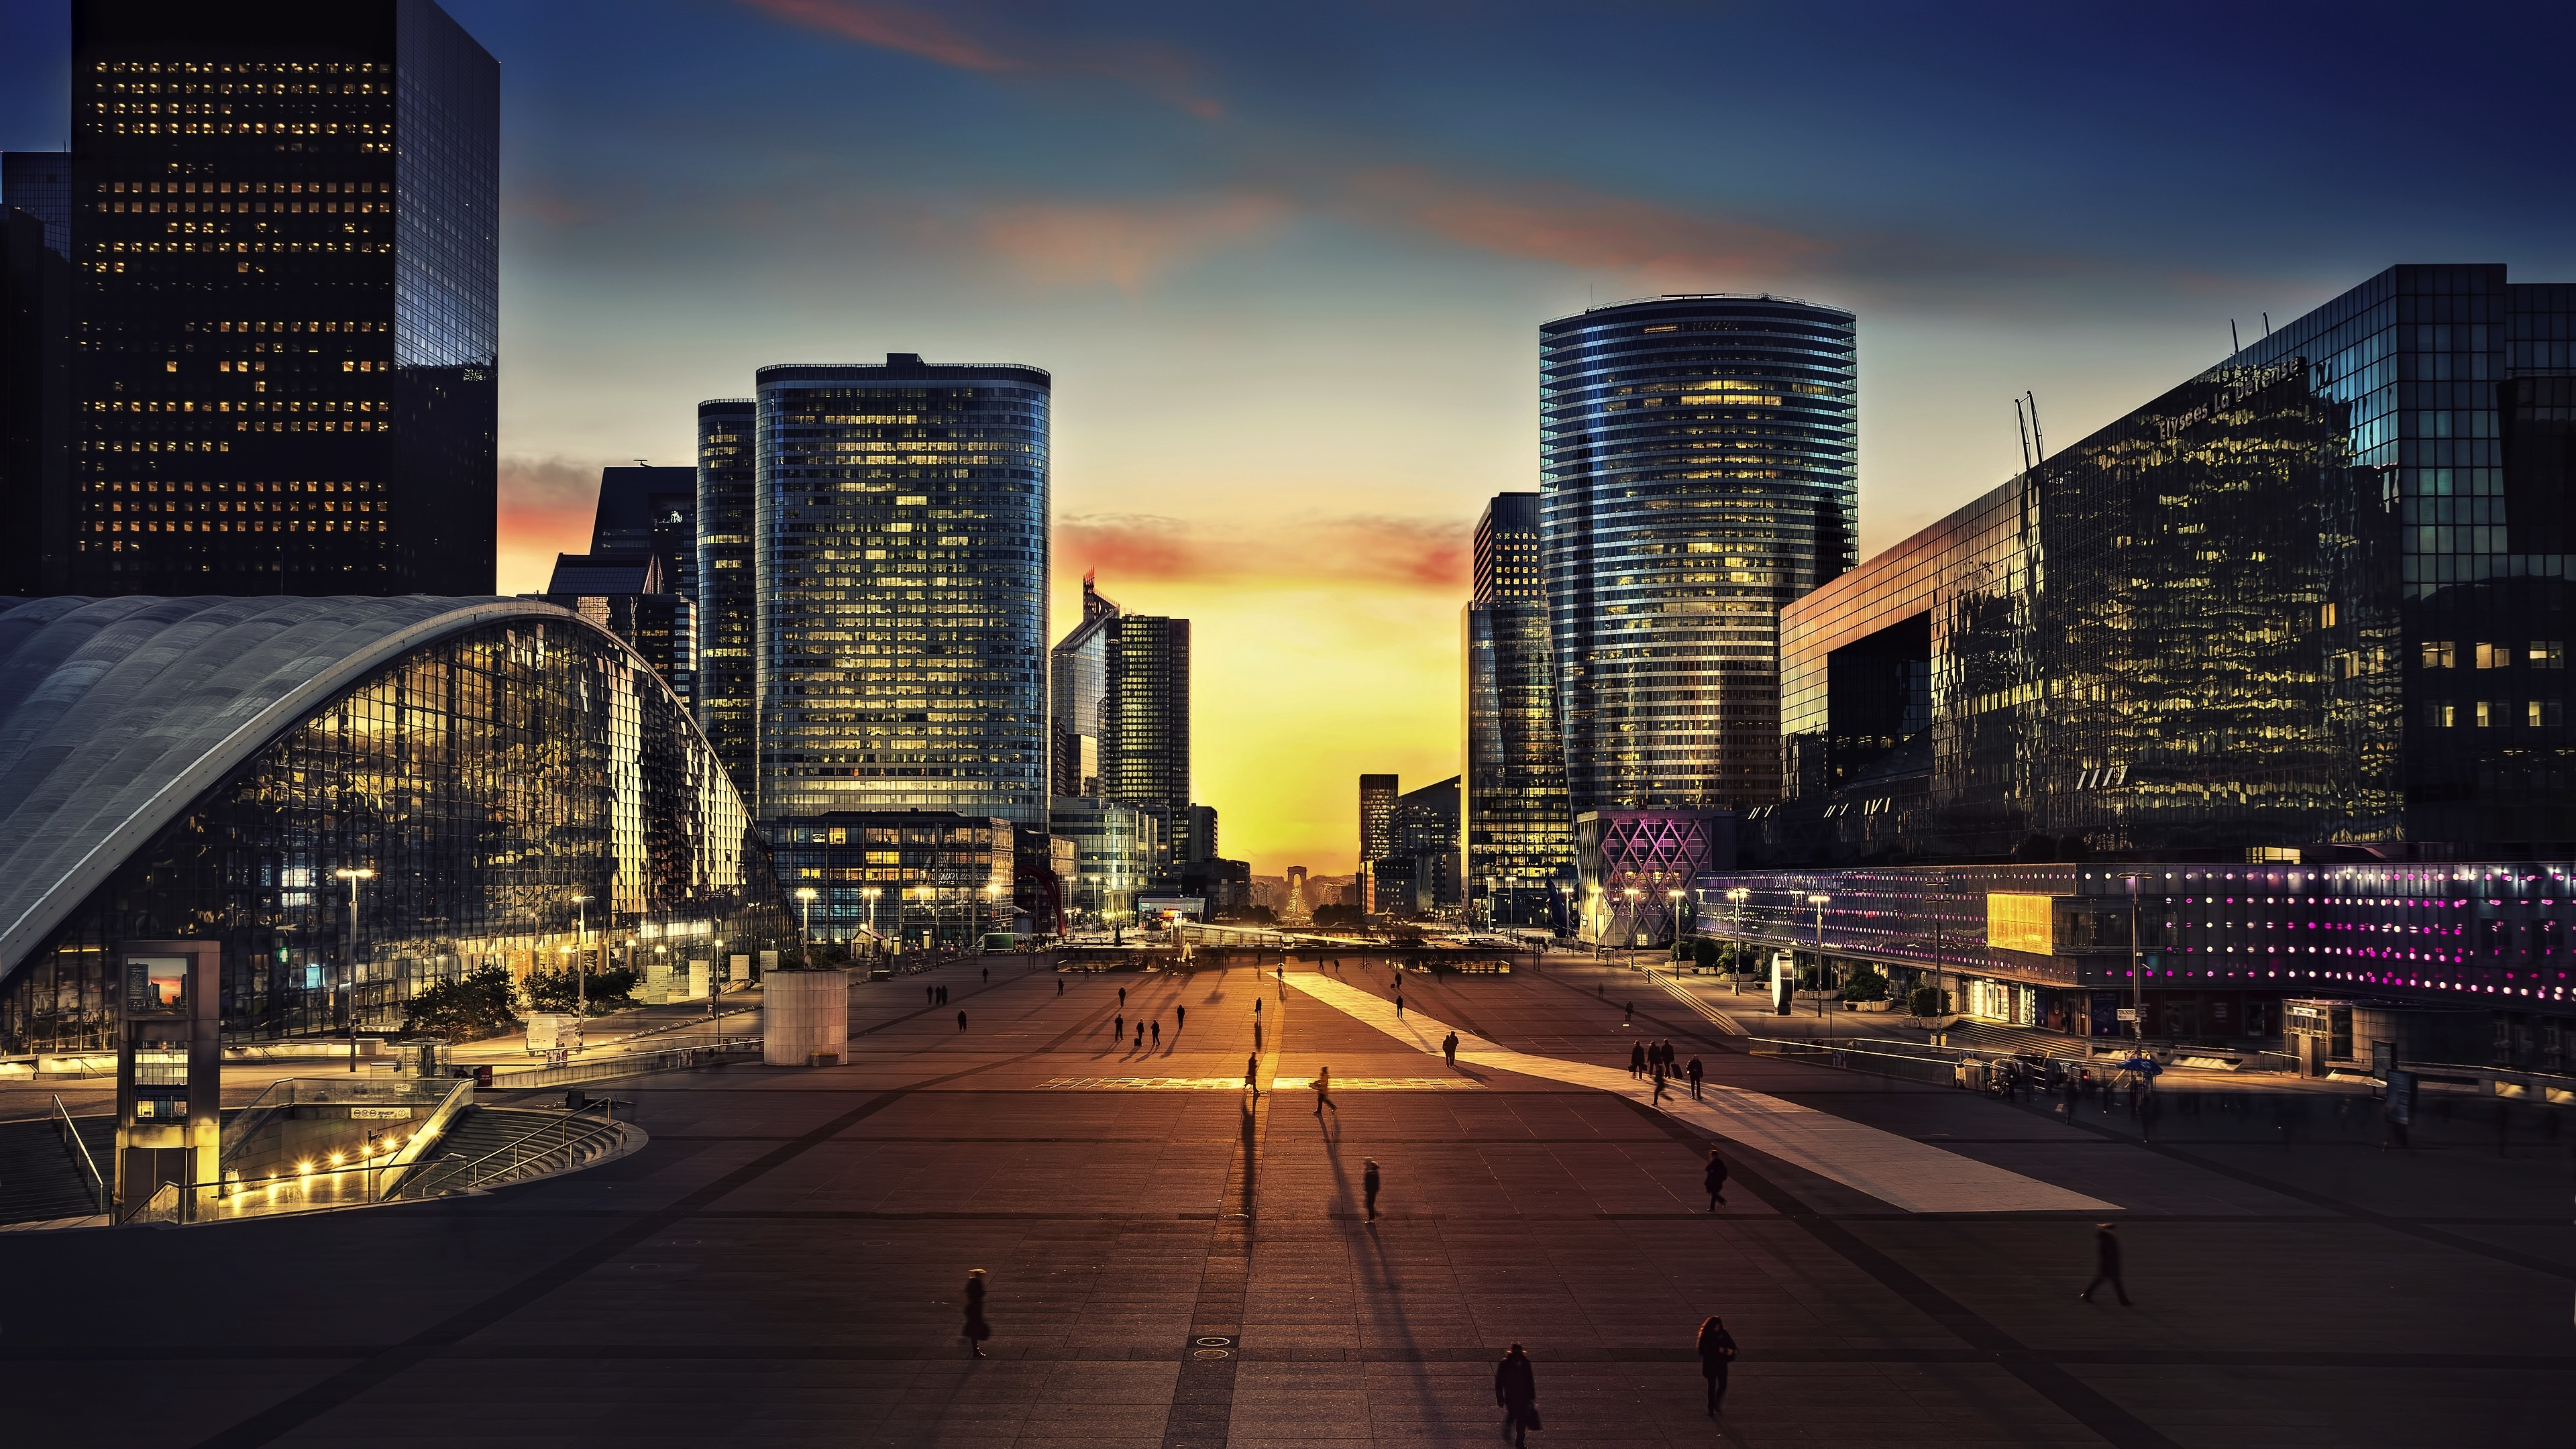 Arc De Triomphe Paris City Night 3840x2400 Wallpaper